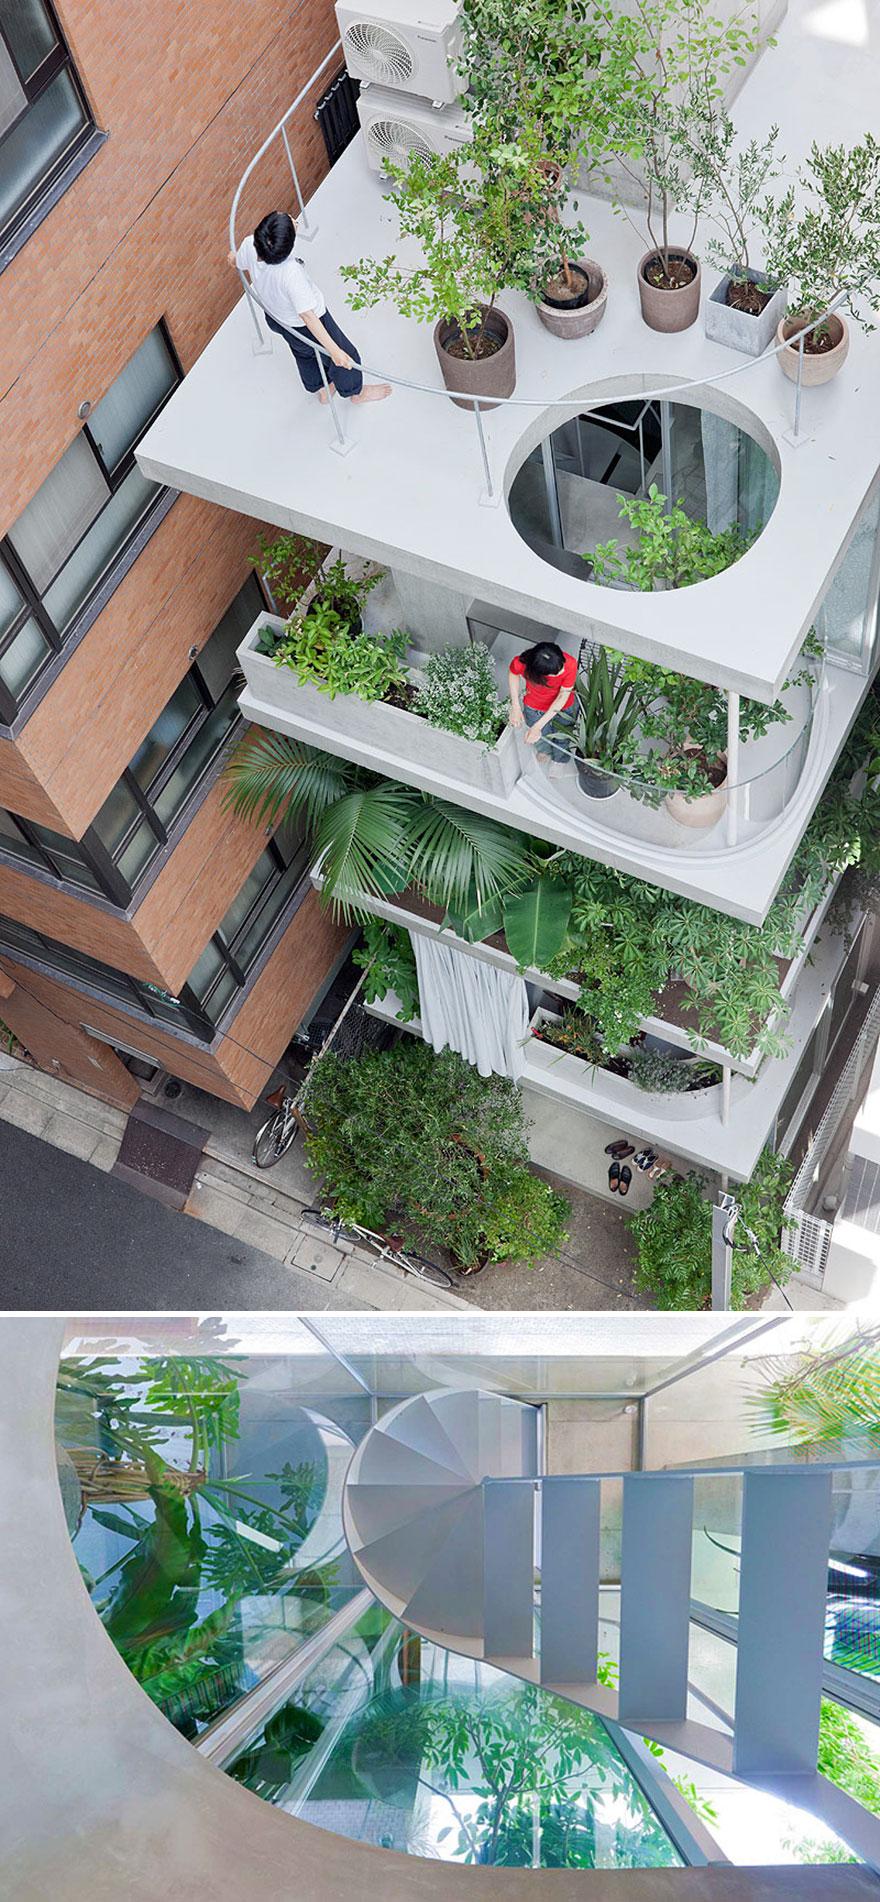 # 8 Maison et jardin, Tokyo